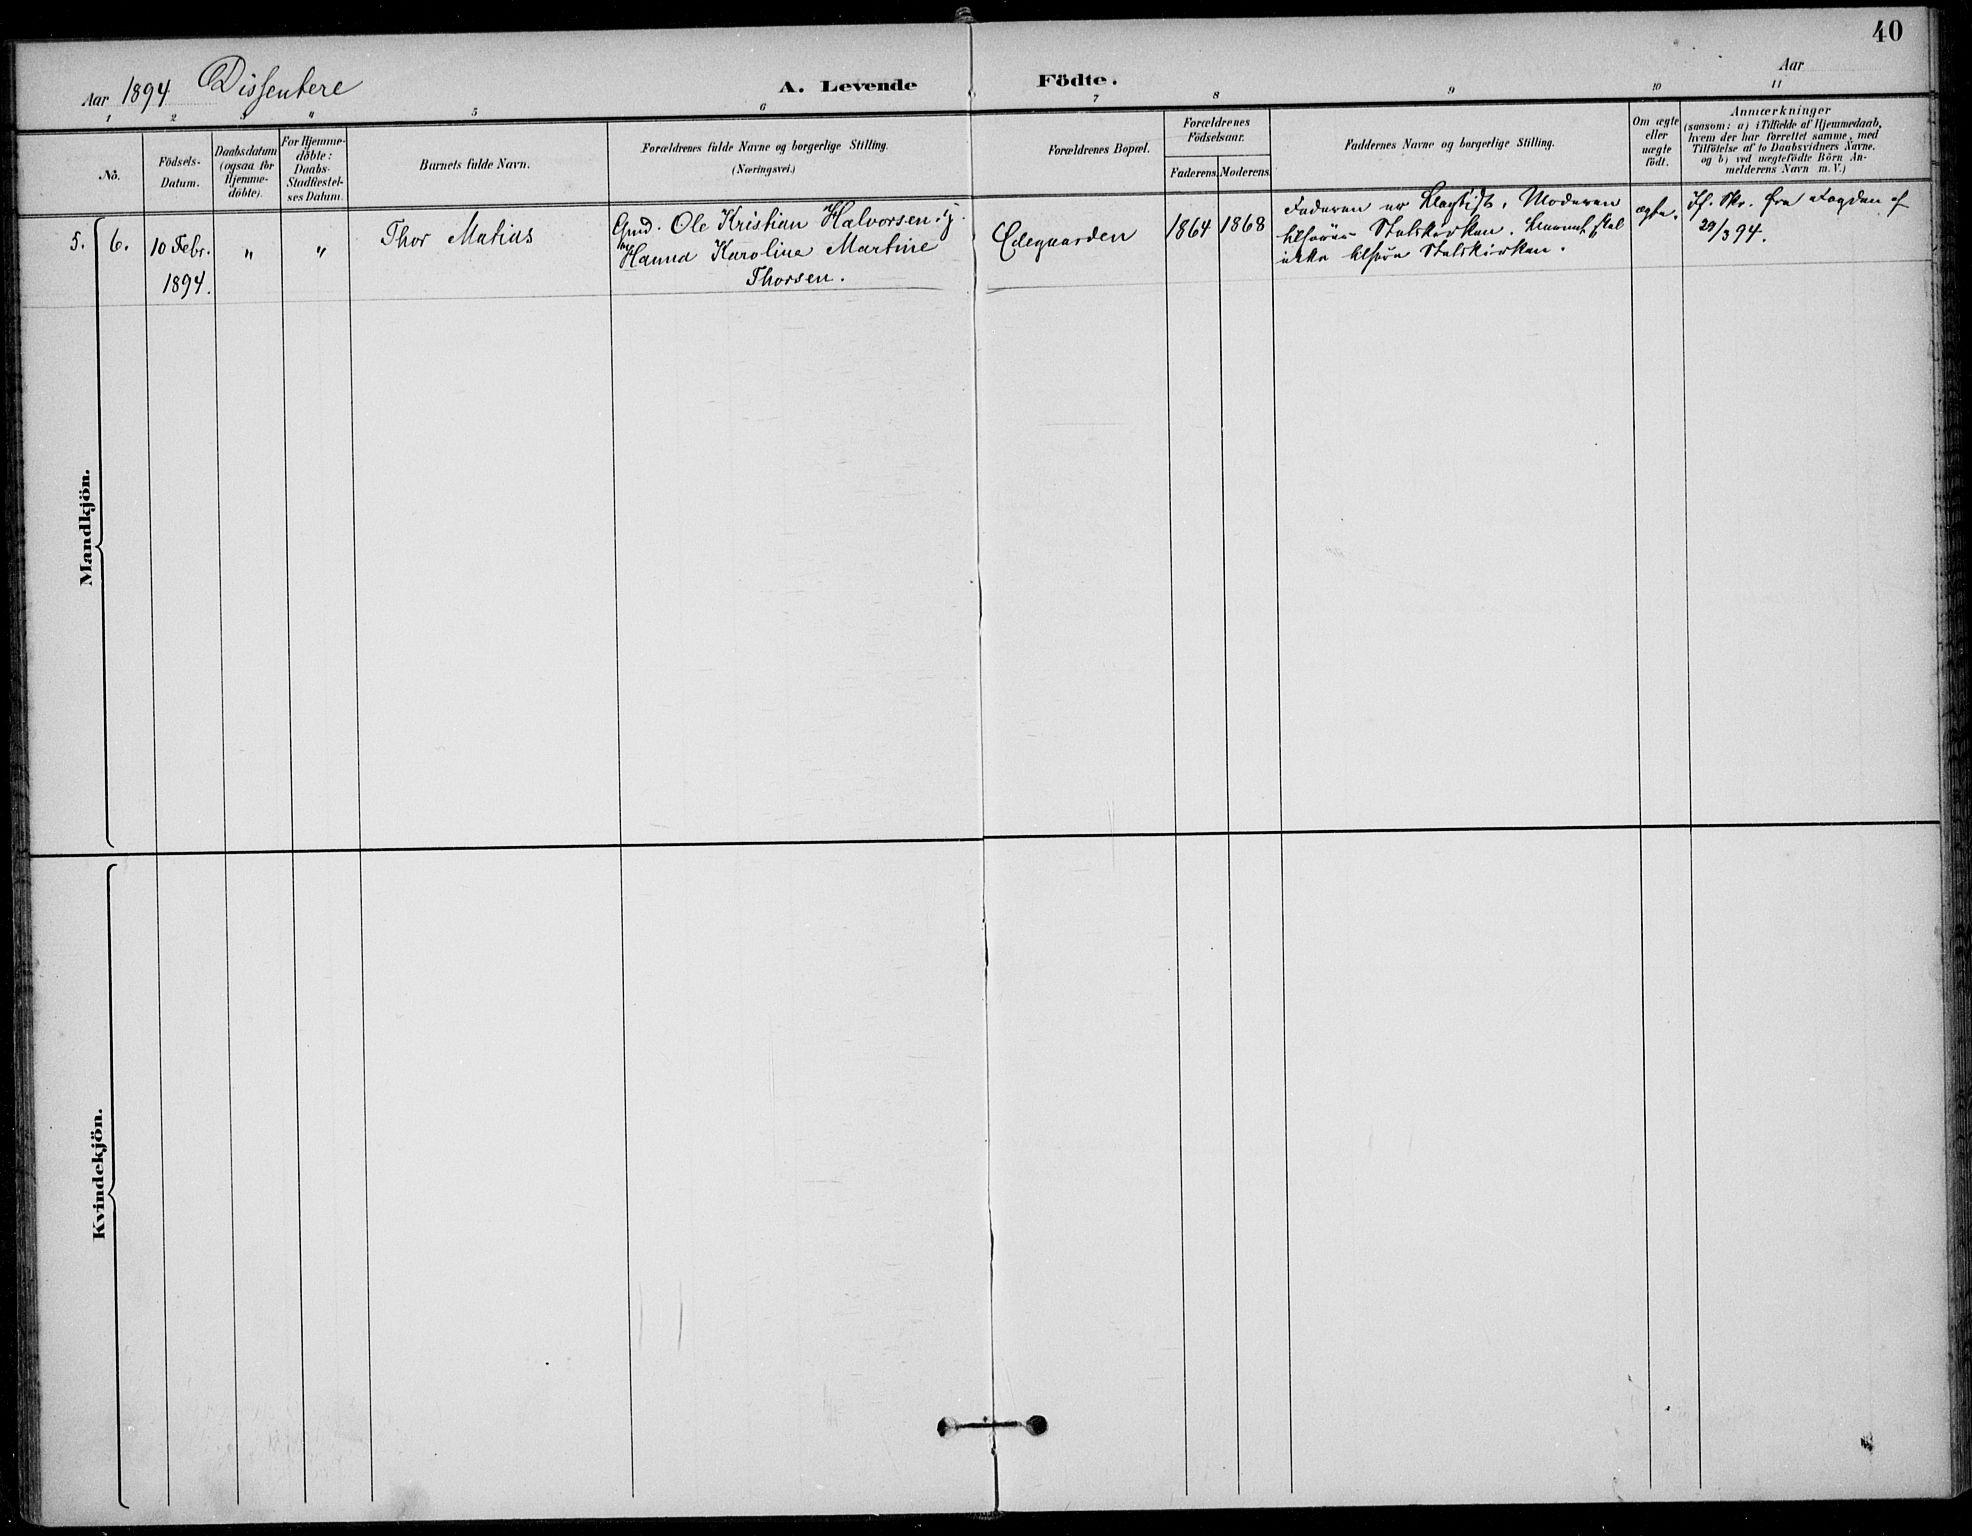 SAKO, Solum kirkebøker, F/Fc/L0002: Ministerialbok nr. III 2, 1892-1906, s. 40